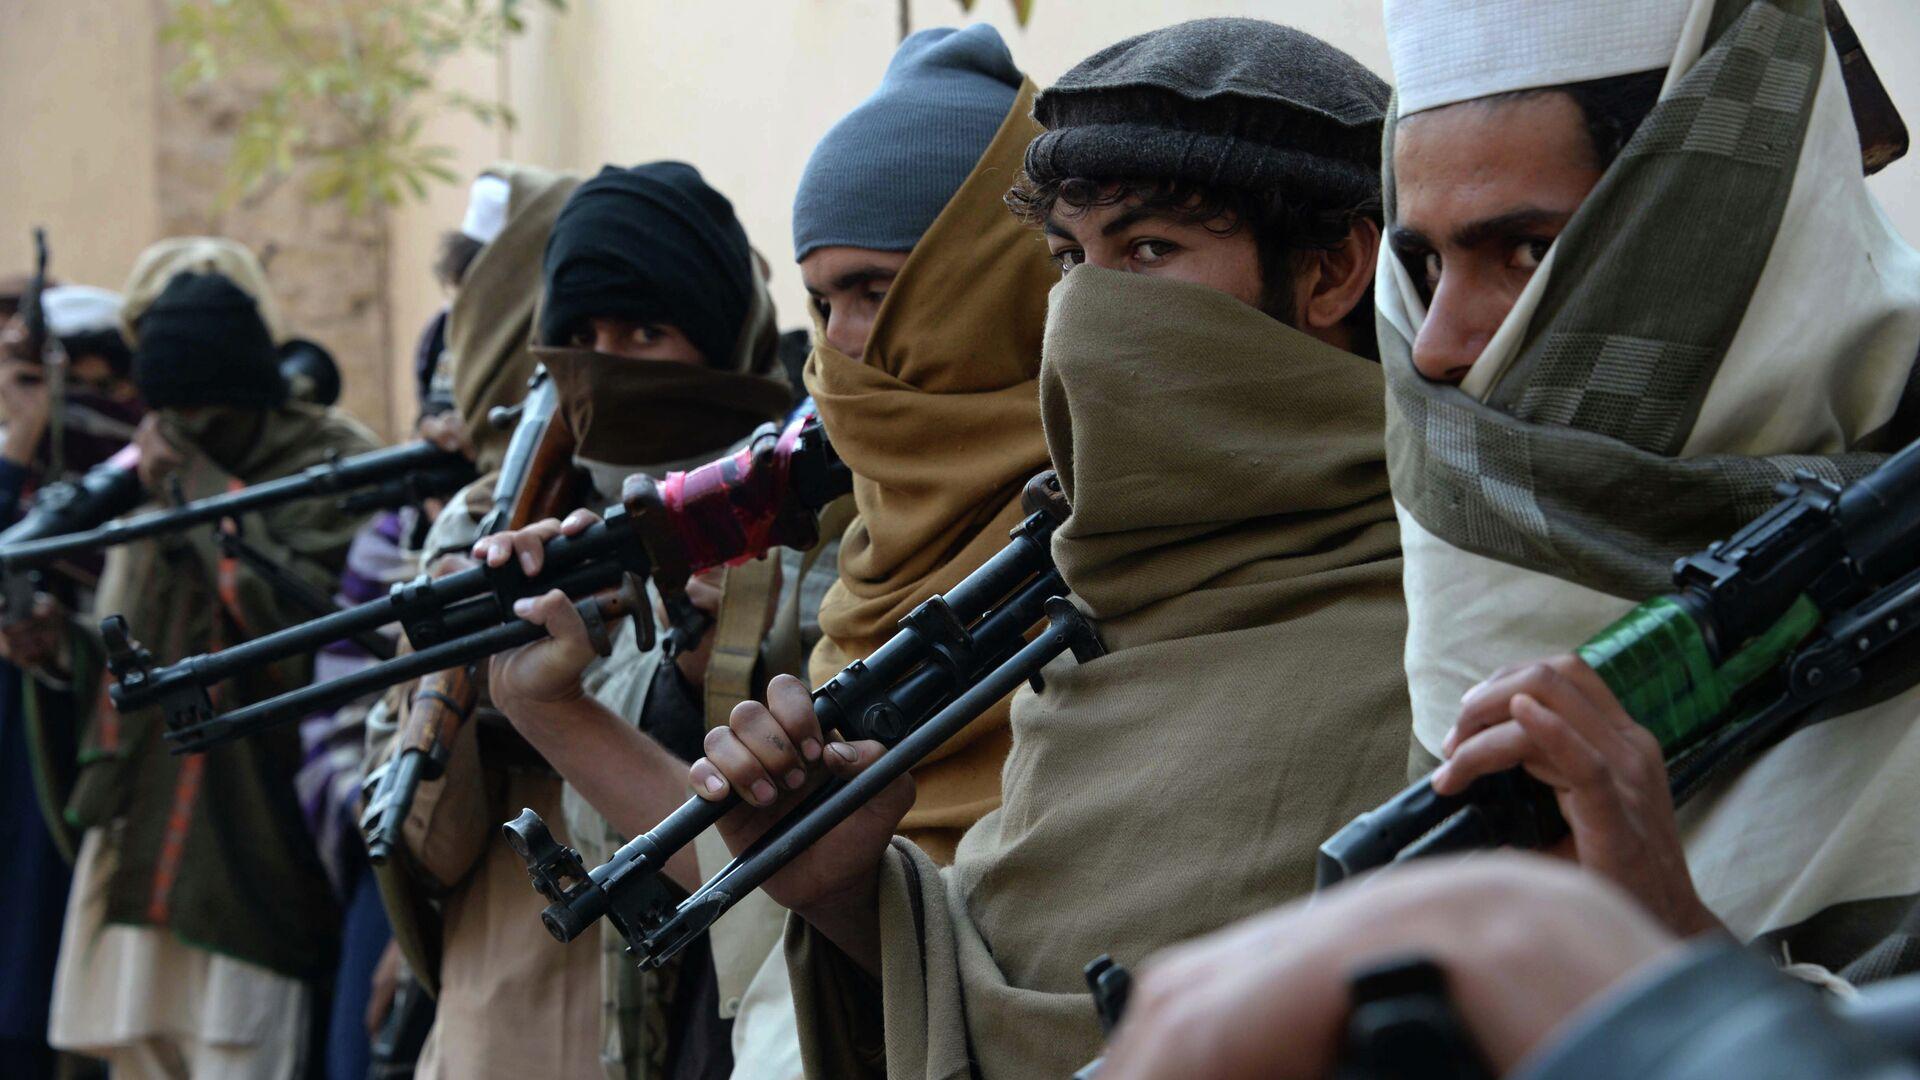 Talibanes afganos (archivo) - Sputnik Mundo, 1920, 17.08.2021